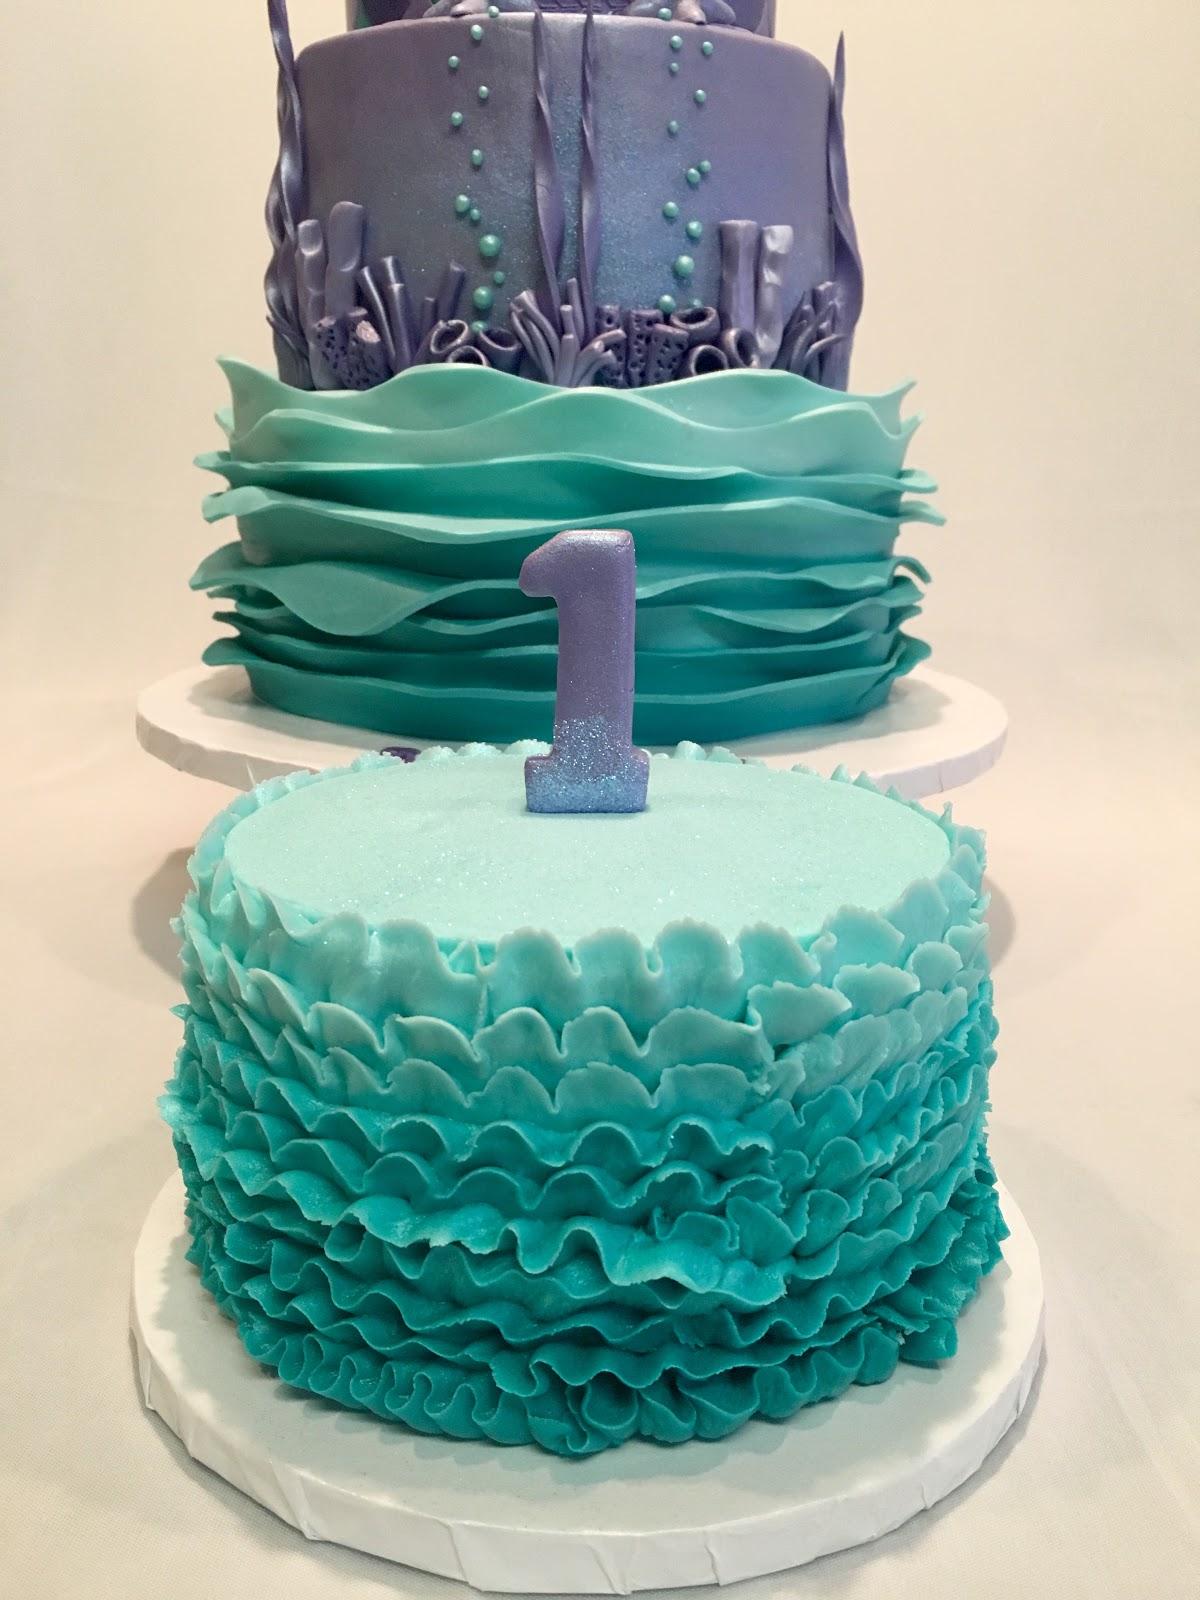 MyMoniCakes: Under the Sea Little Mermaid Theme cake with